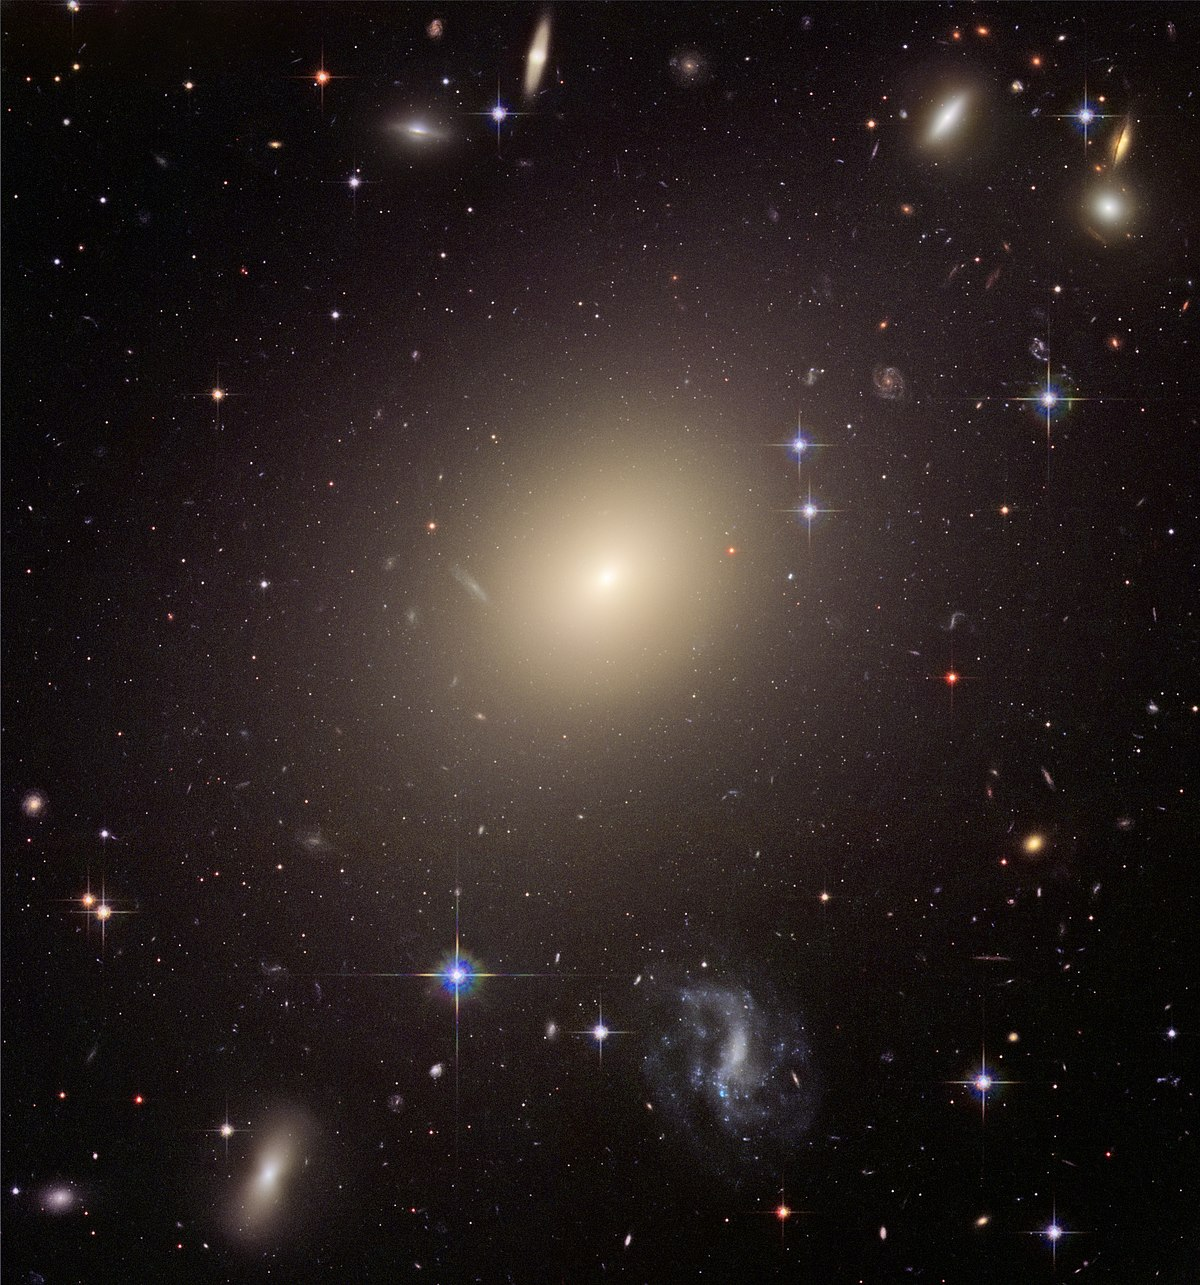 Elliptische Galaxie Wikipedia